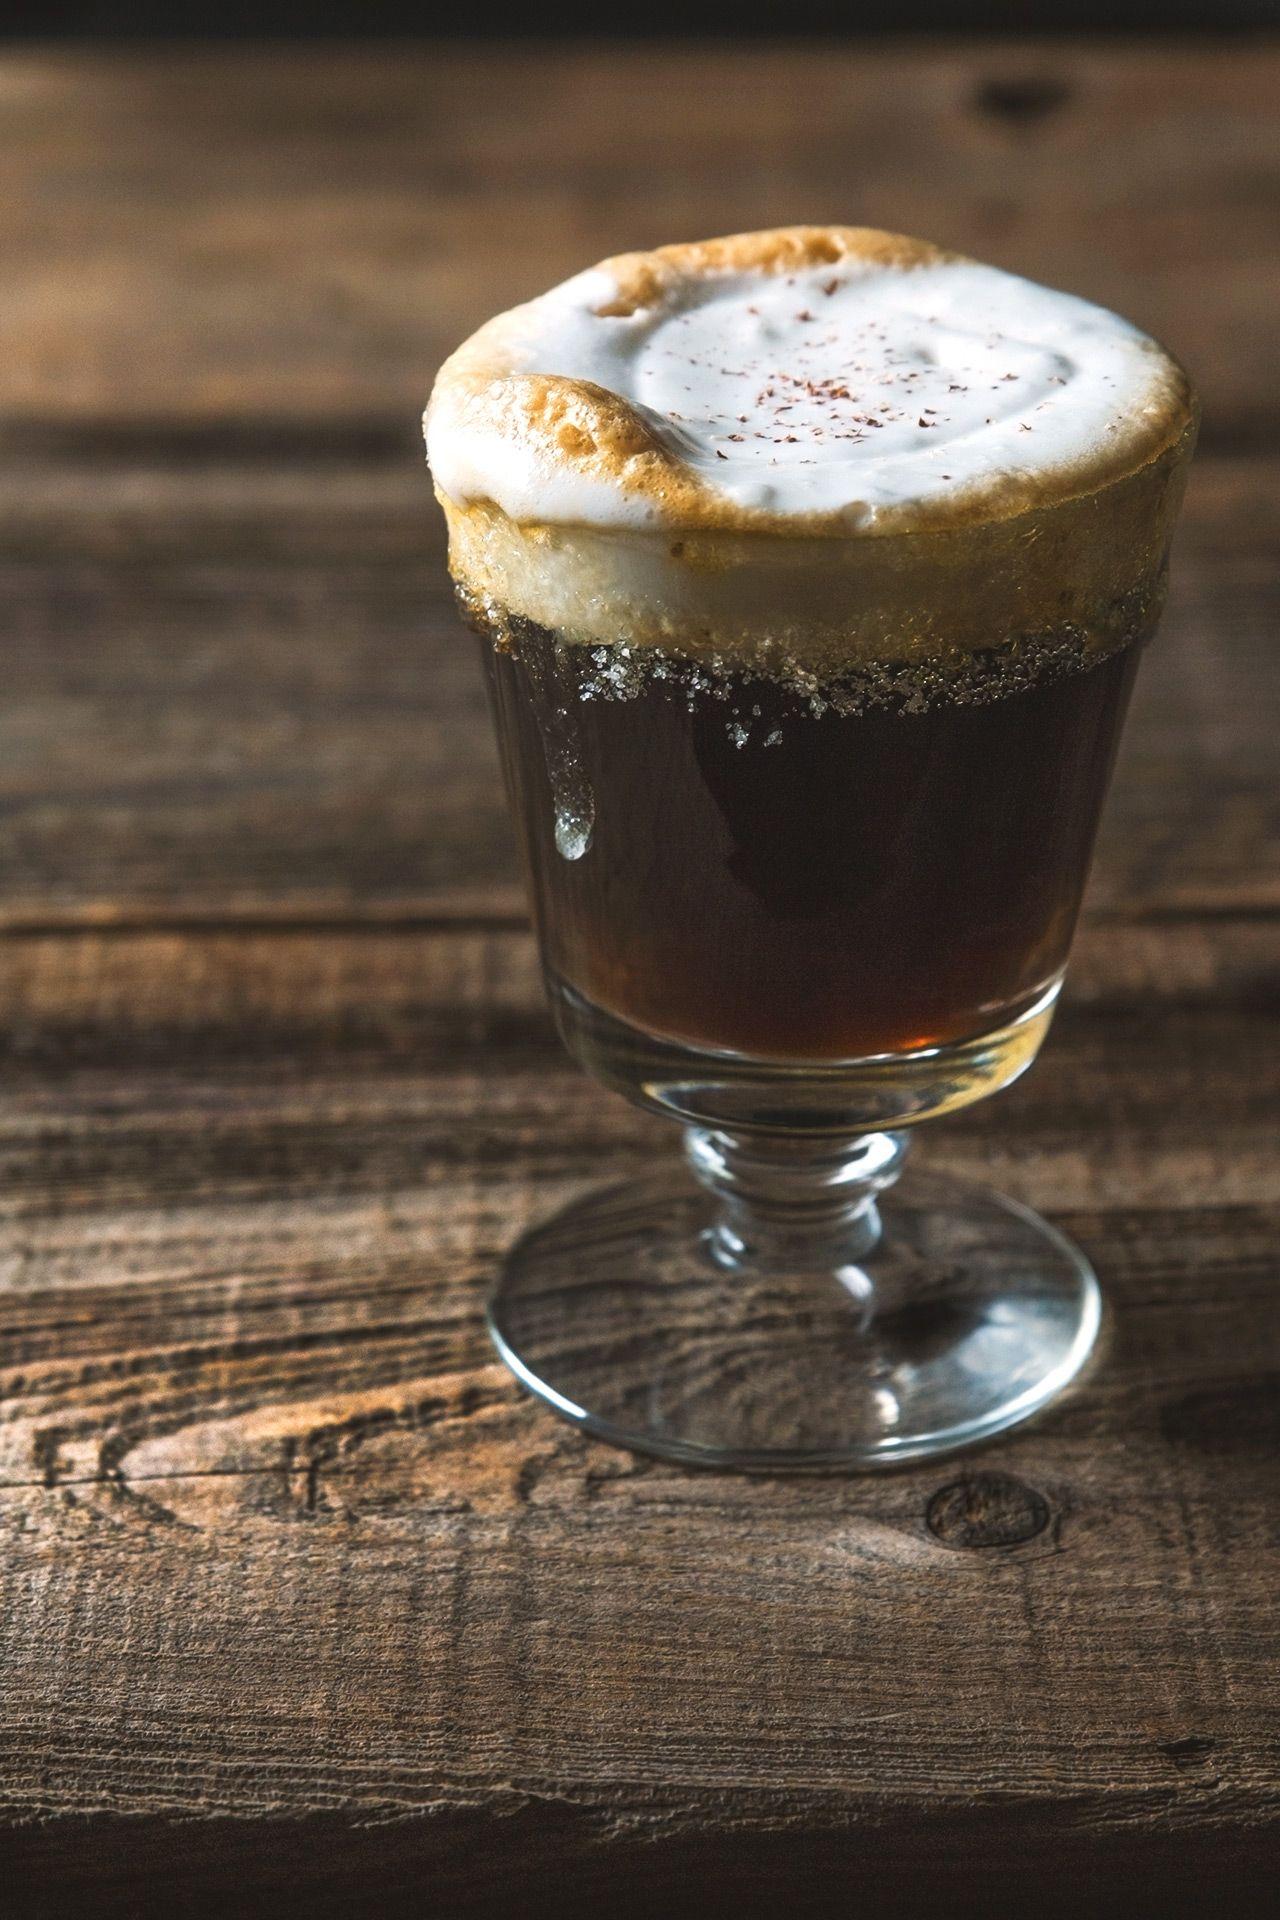 Spanish Coffee Nespresso Recipe Spanish Coffee Coffee Recipes Single Serve Coffee Makers